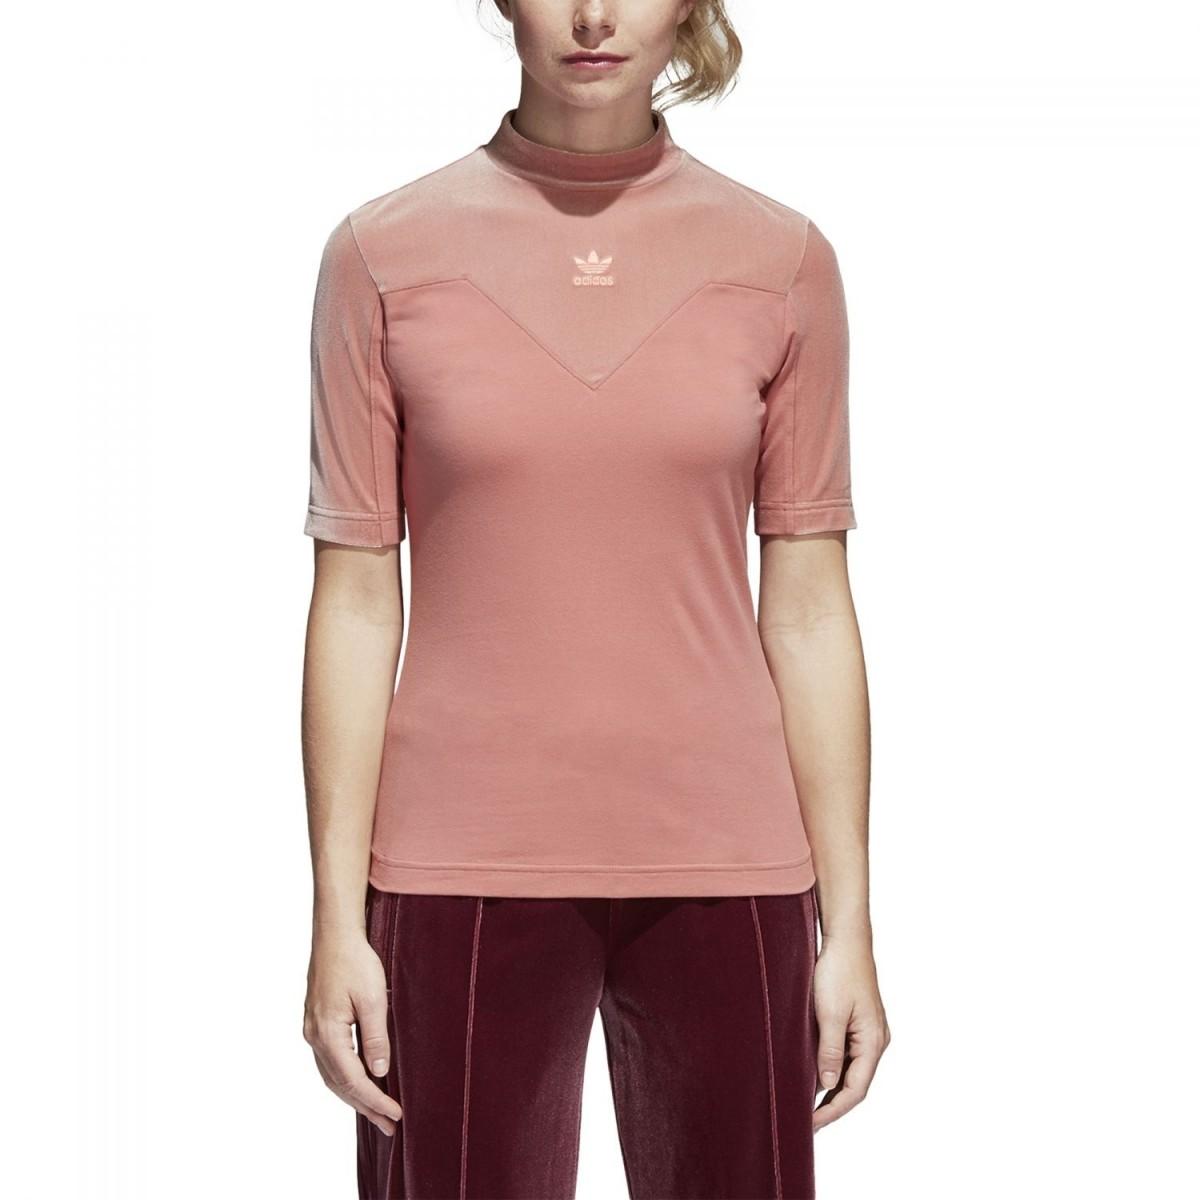 adidas Originals Velvet Vibes High Neck T-Shirt